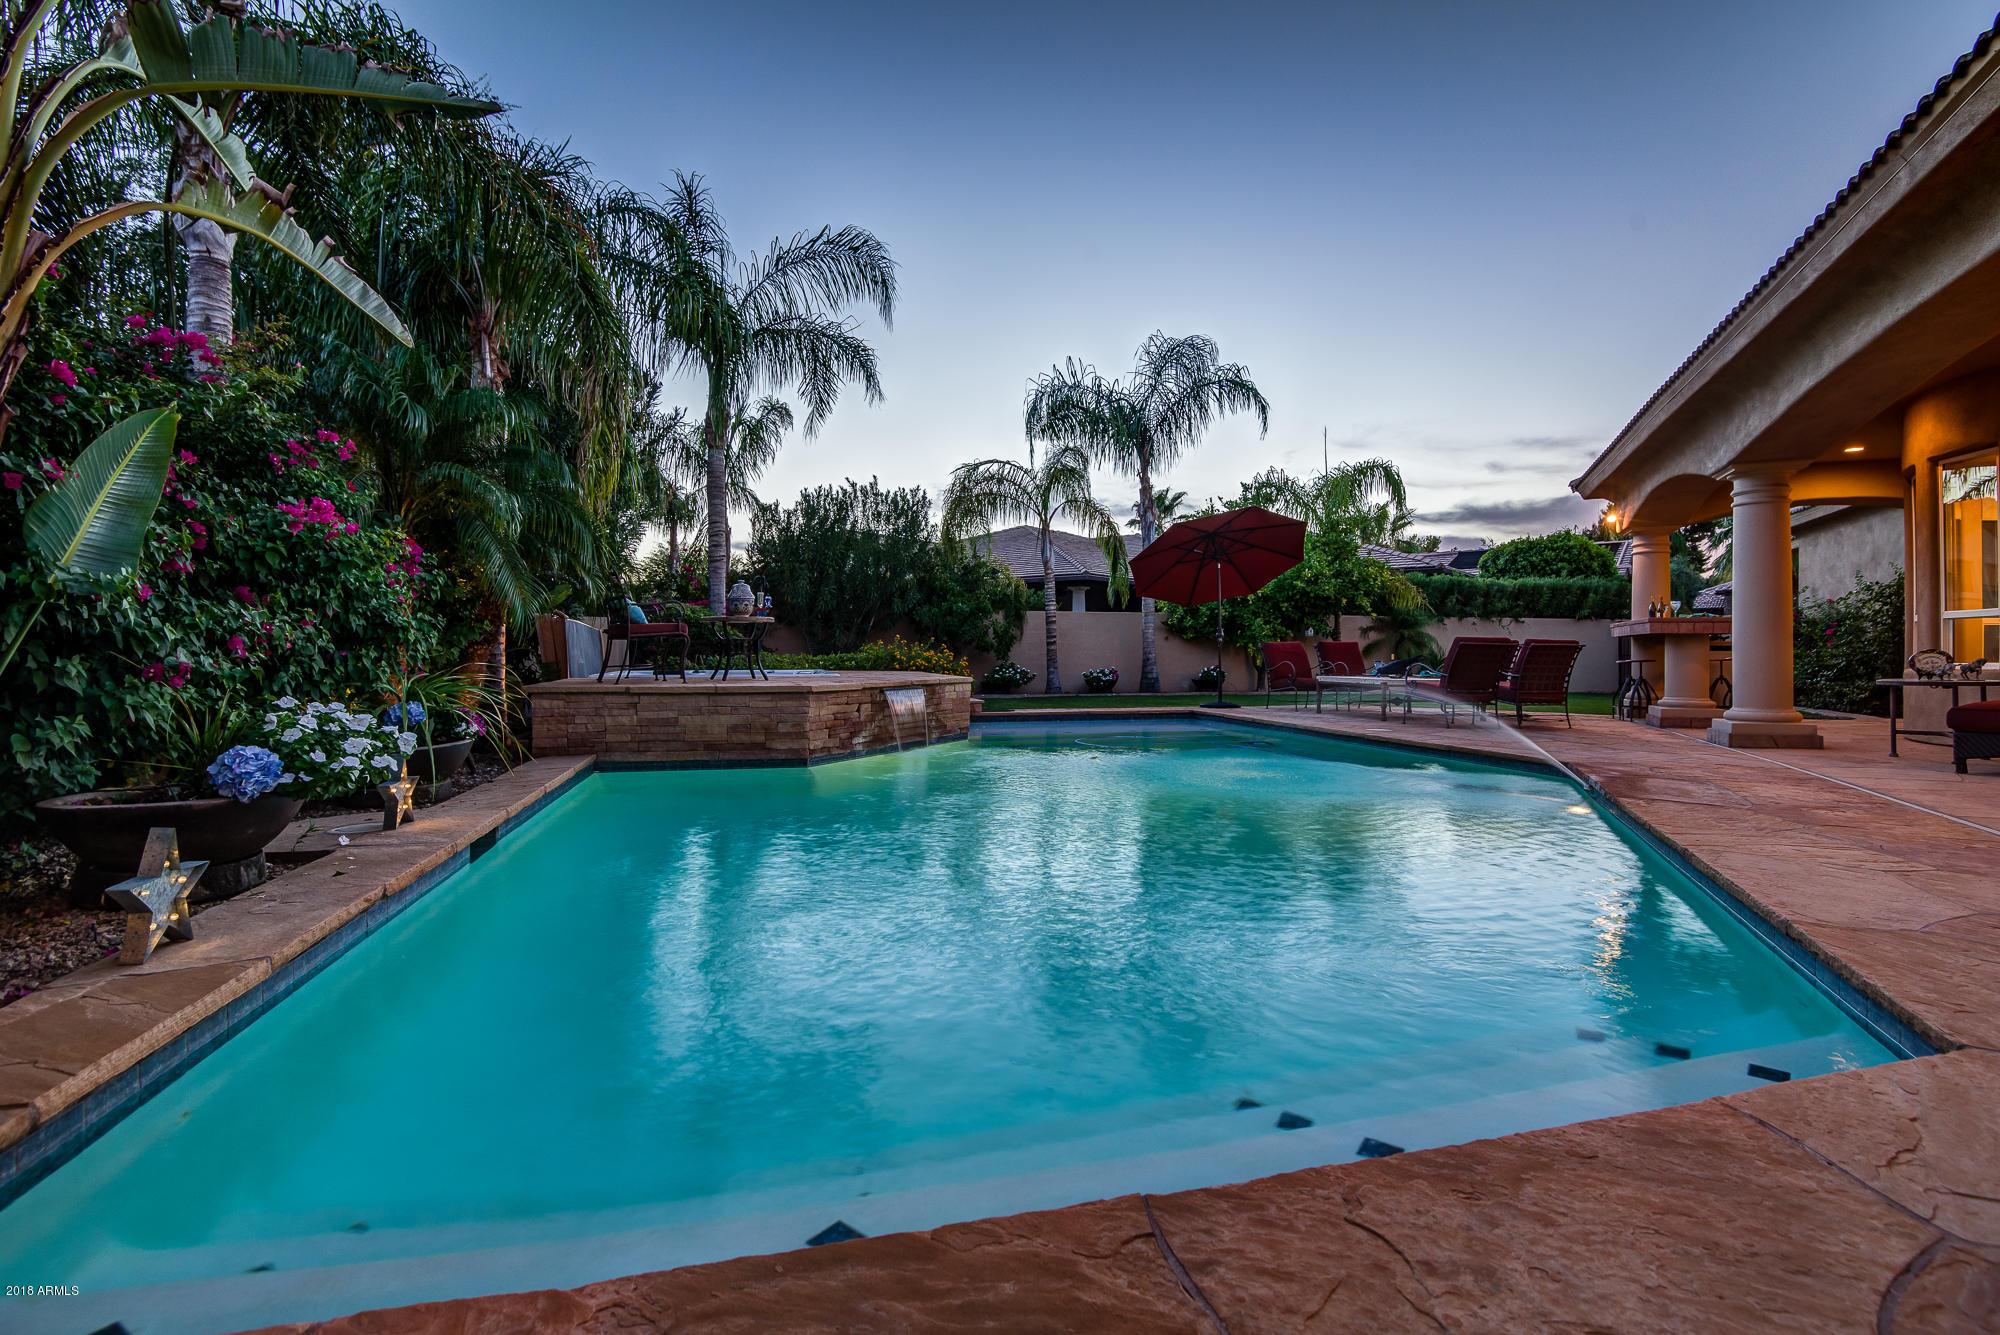 MLS 5814930 376 N CLOVERFIELD Circle, Litchfield Park, AZ 85340 Litchfield Park AZ Four Bedroom